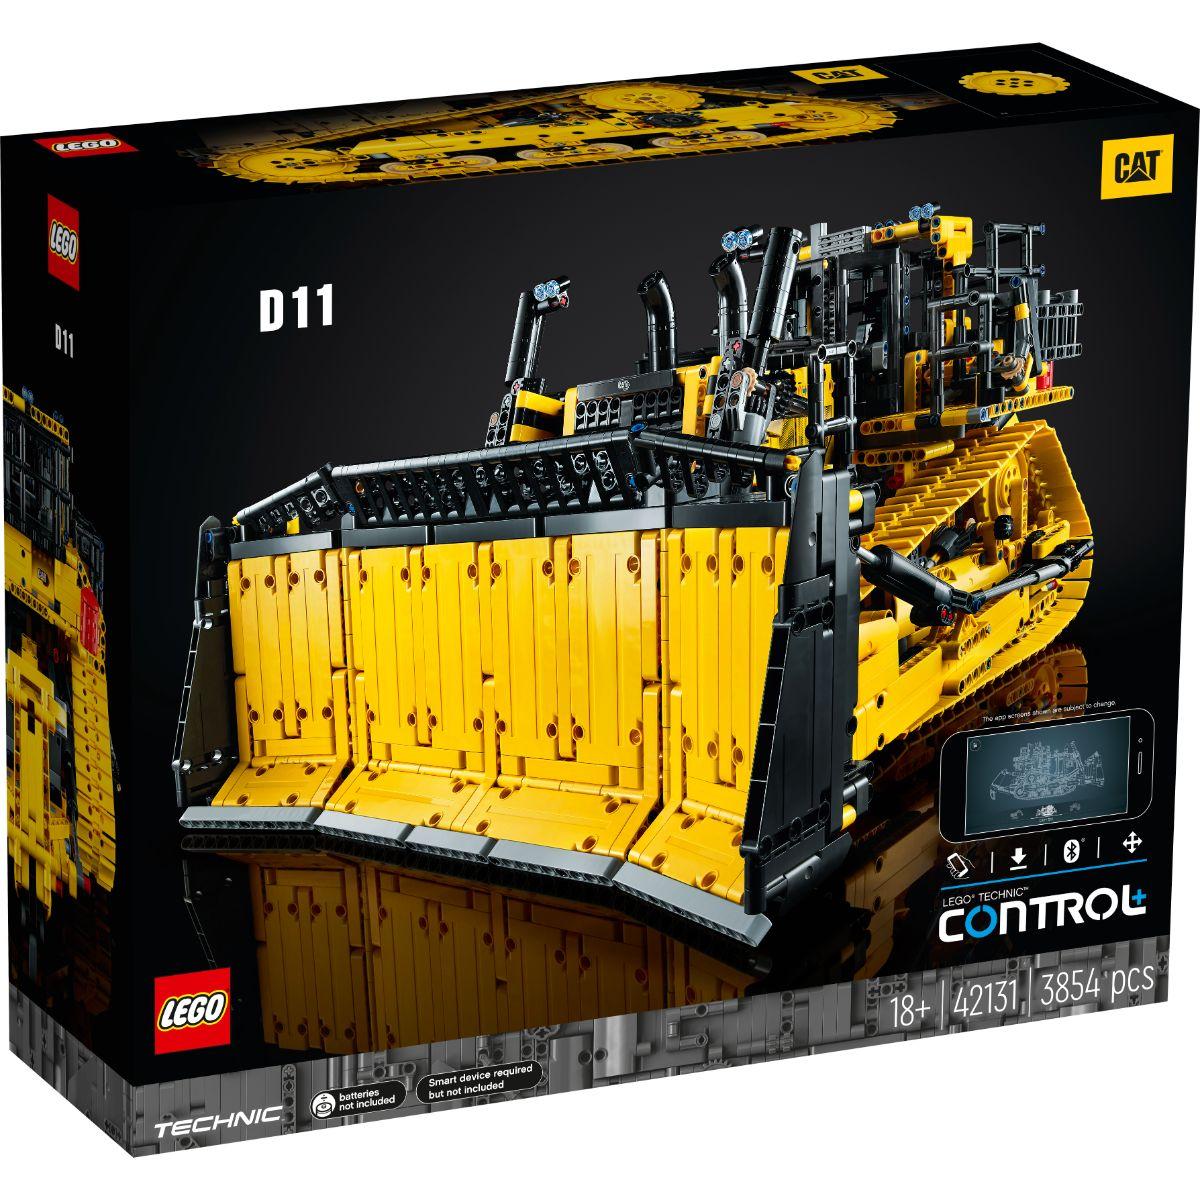 LEGO® Technic - Buldozer Cat D11T (42131)